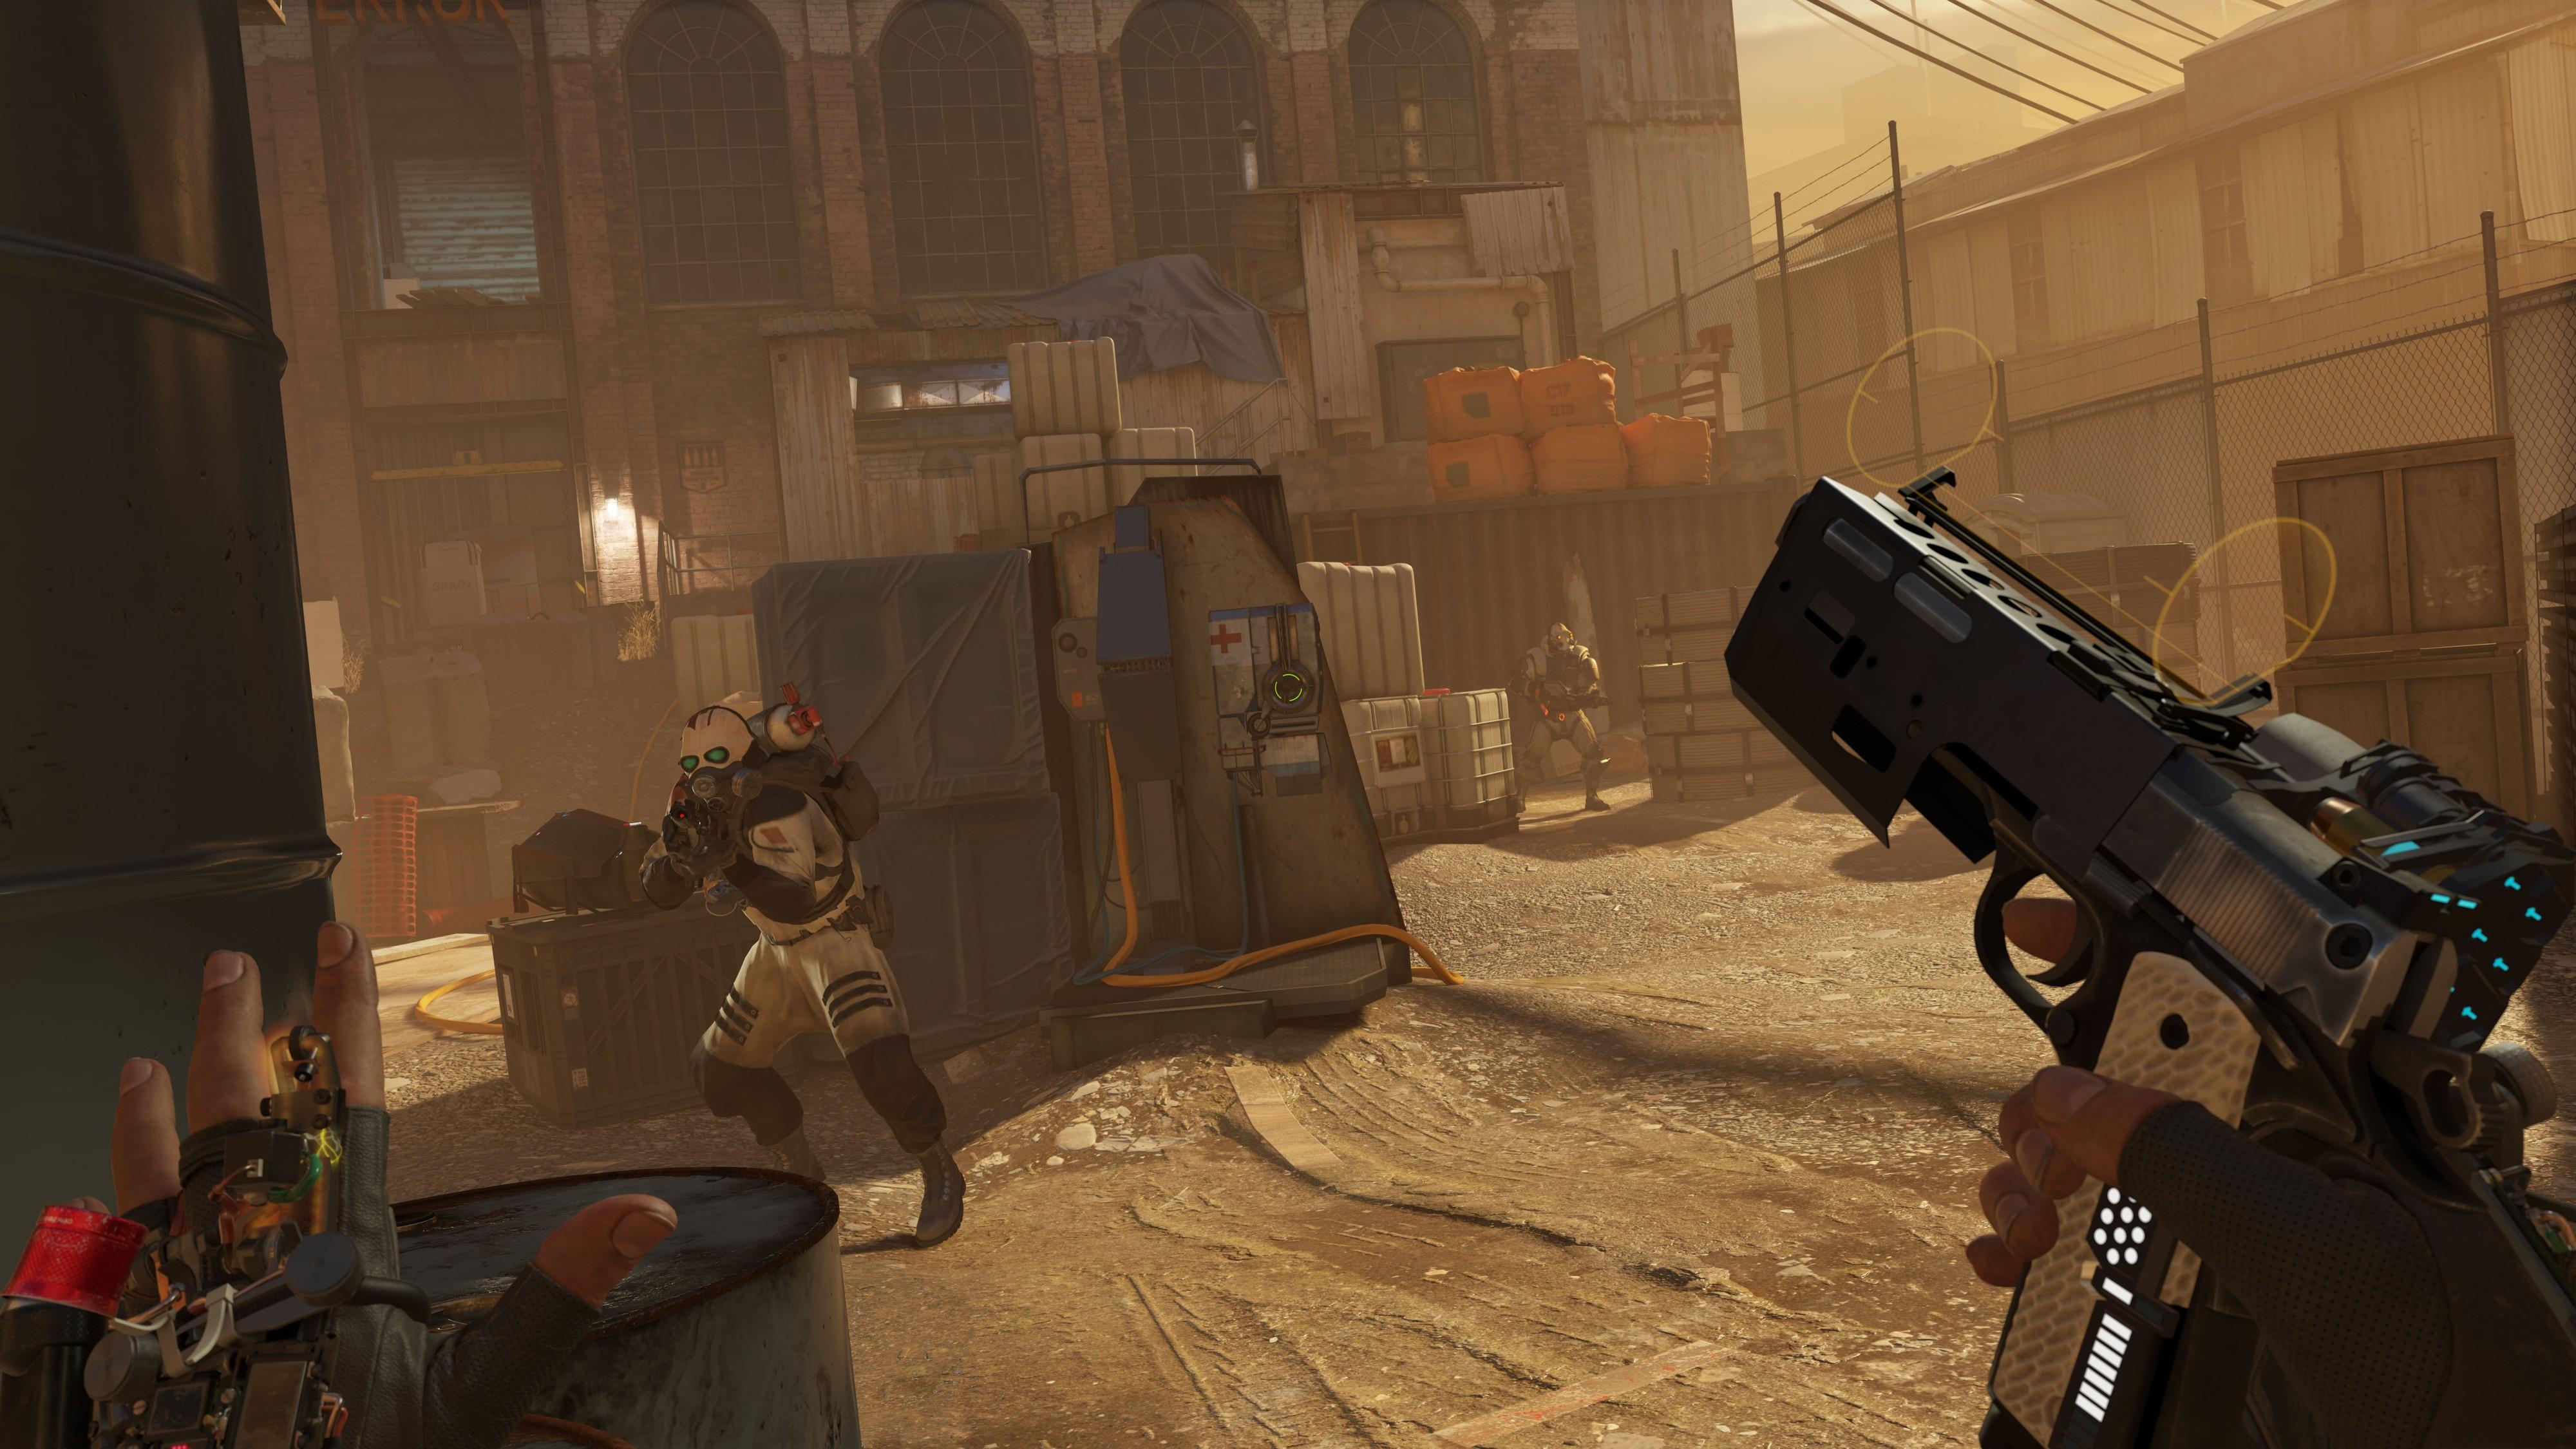 A press shot of VR game Half-Life: Alyx